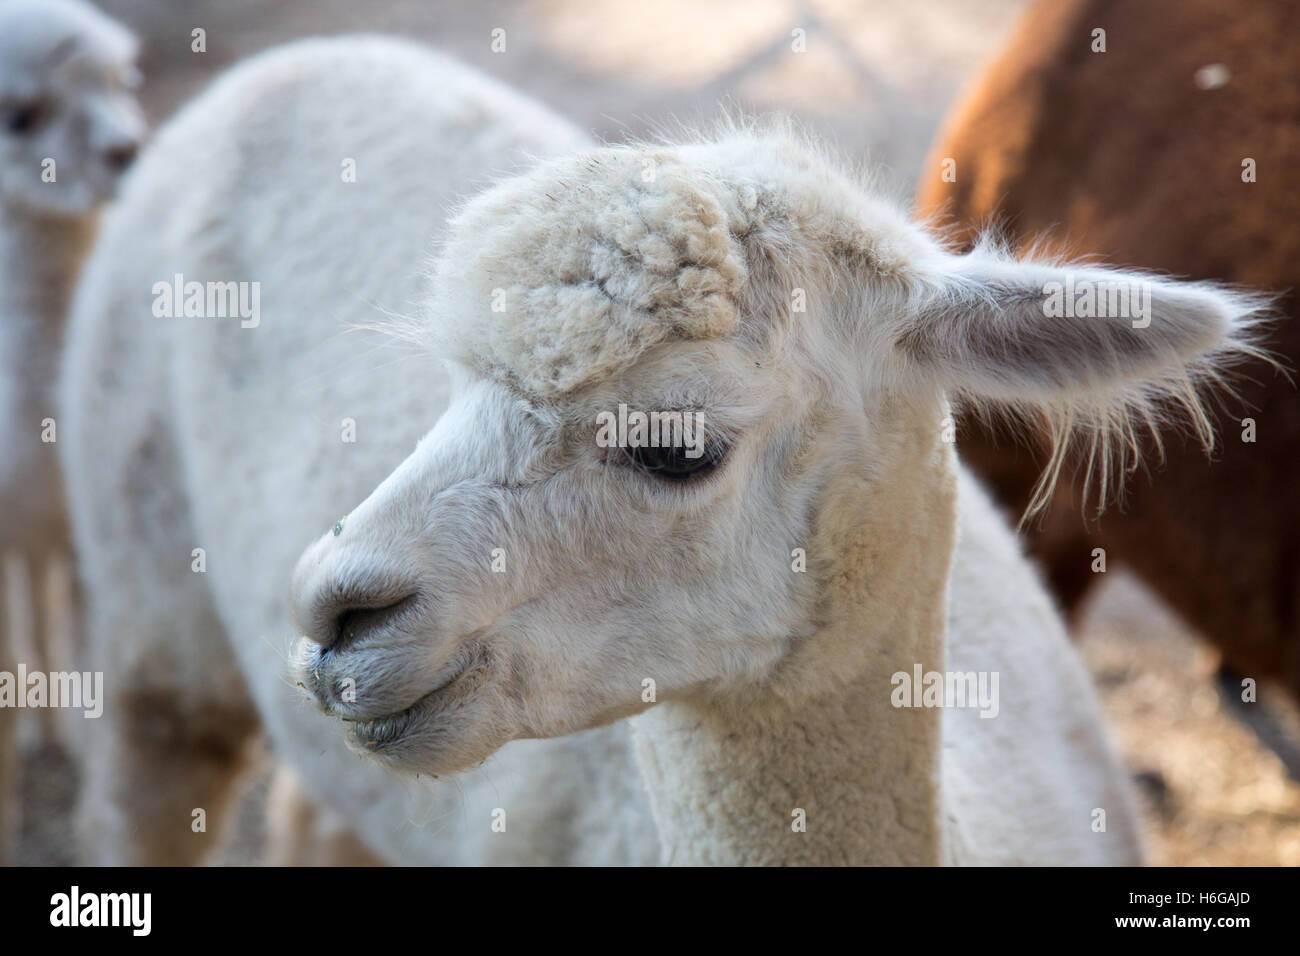 alpaca (Vicugna pacos) on a farm in New south wales,Australia Stock Photo